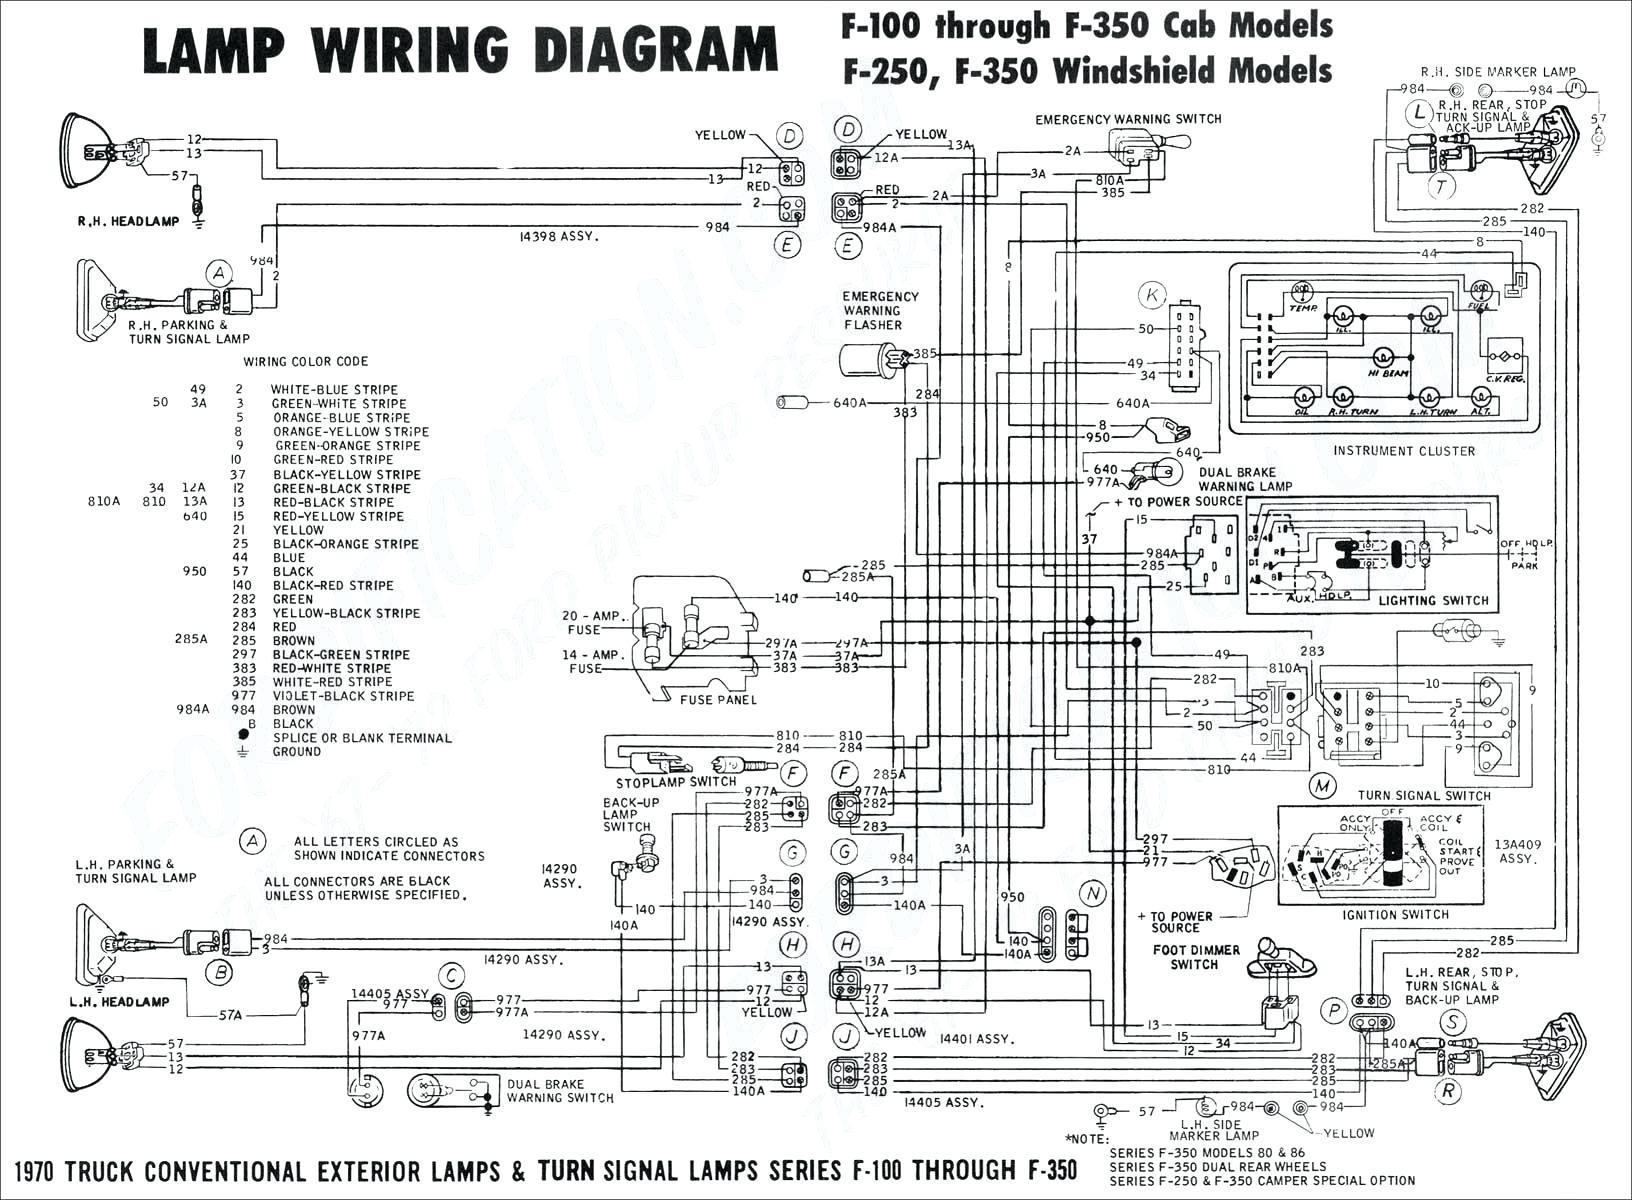 John Deere 4020 Starter Wiring Diagram Starter Generator Wiring Diagram 5af A8d5 E30 Ignition Switch 2 Of John Deere 4020 Starter Wiring Diagram